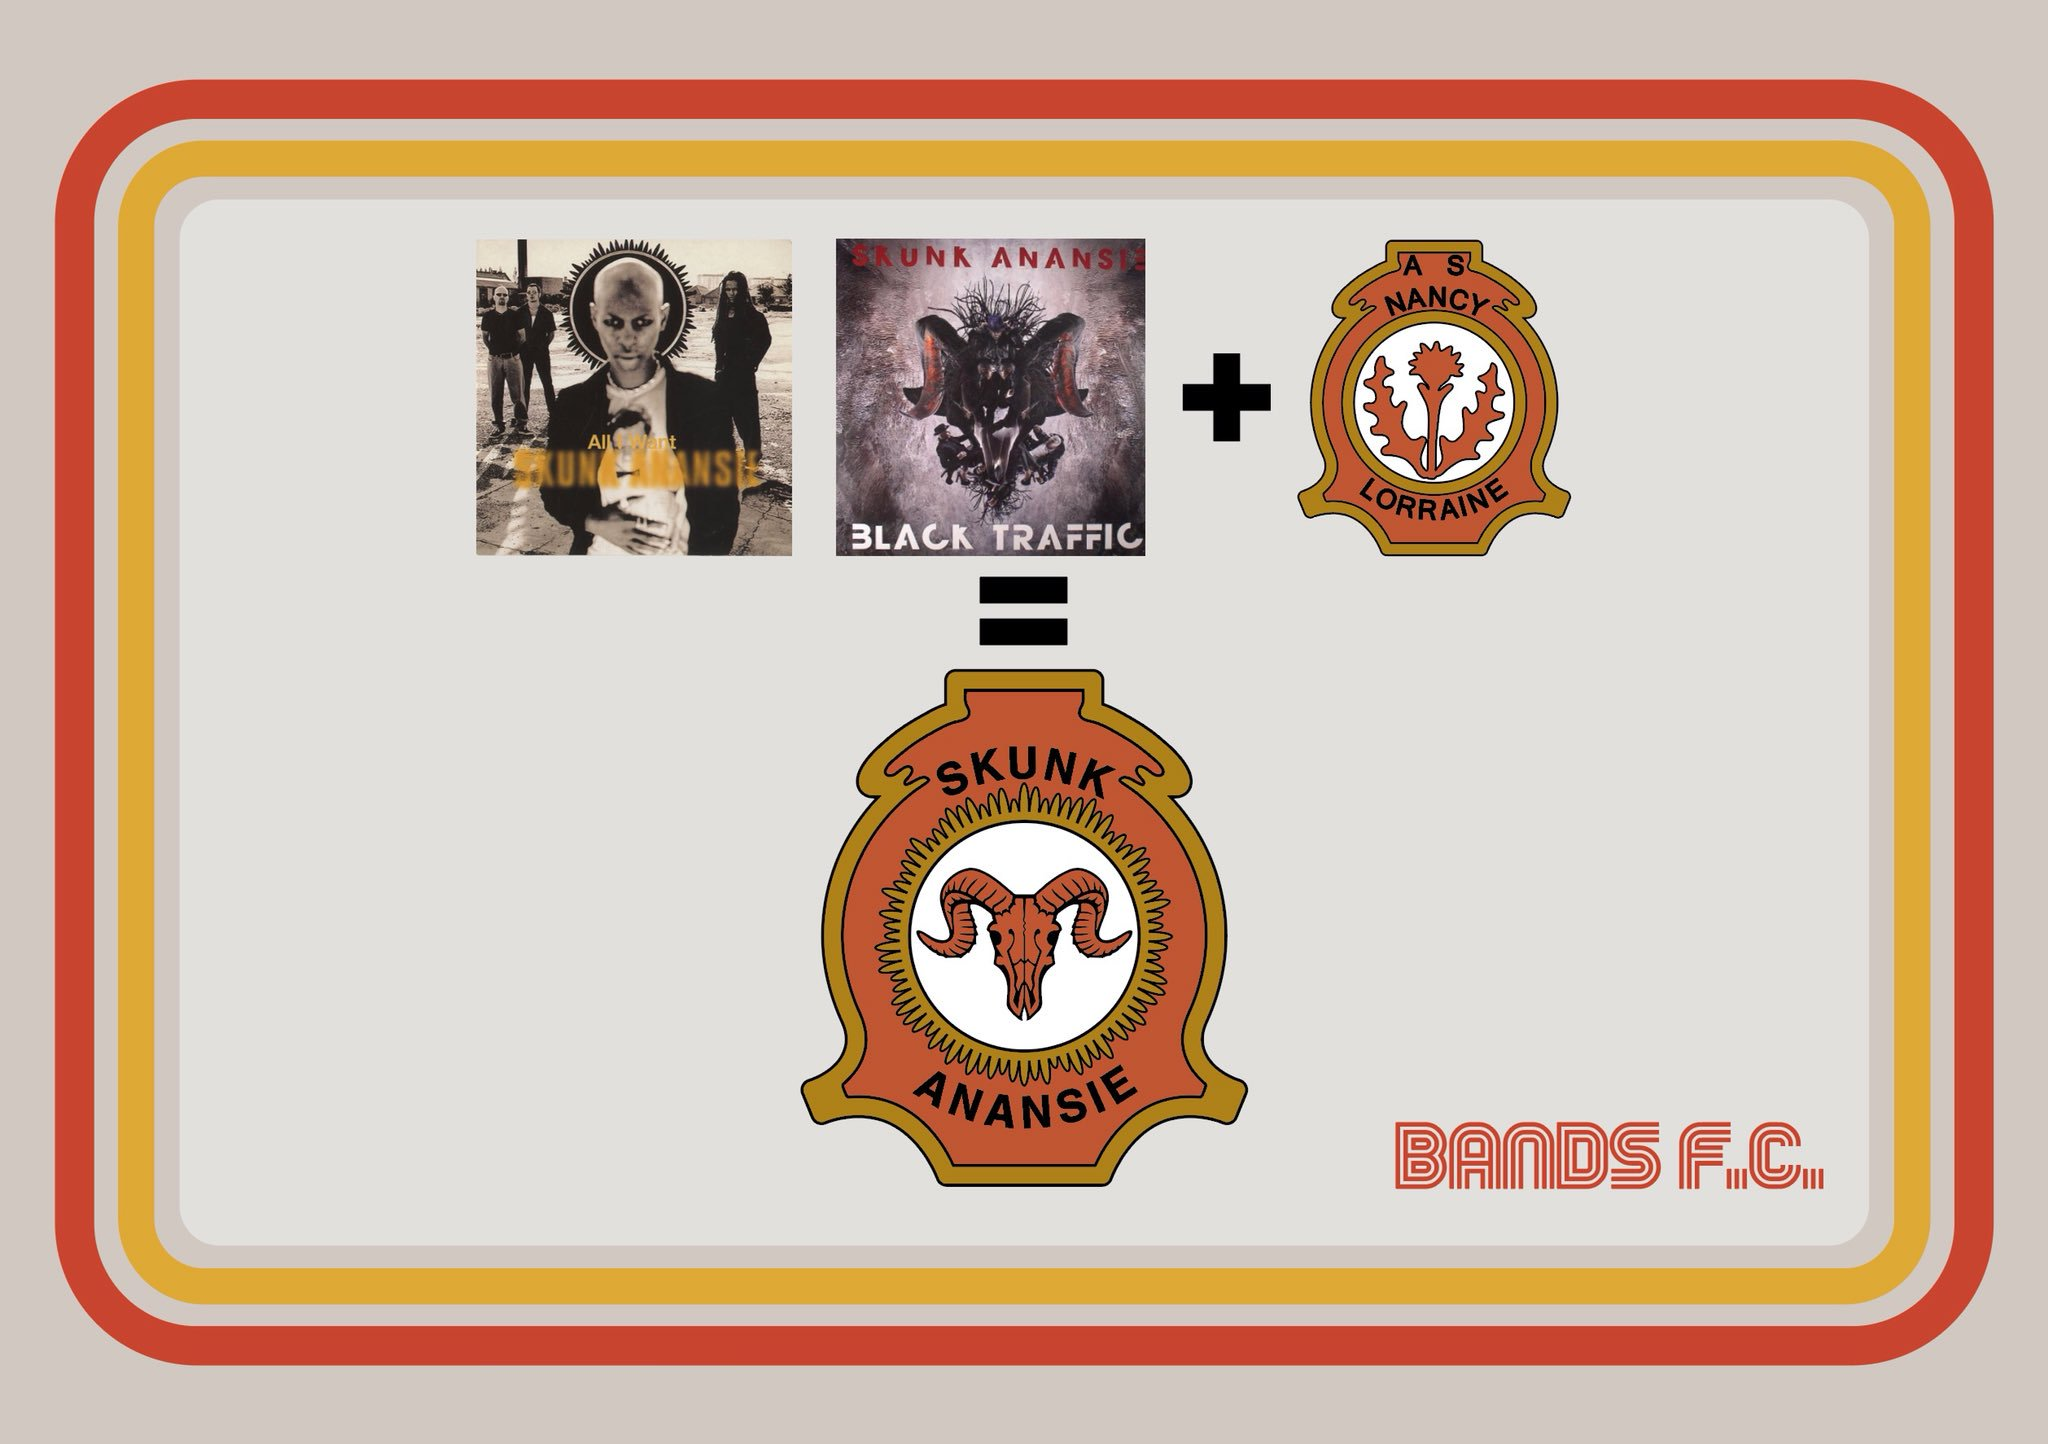 08b4a39e4d Bands FC on Twitter